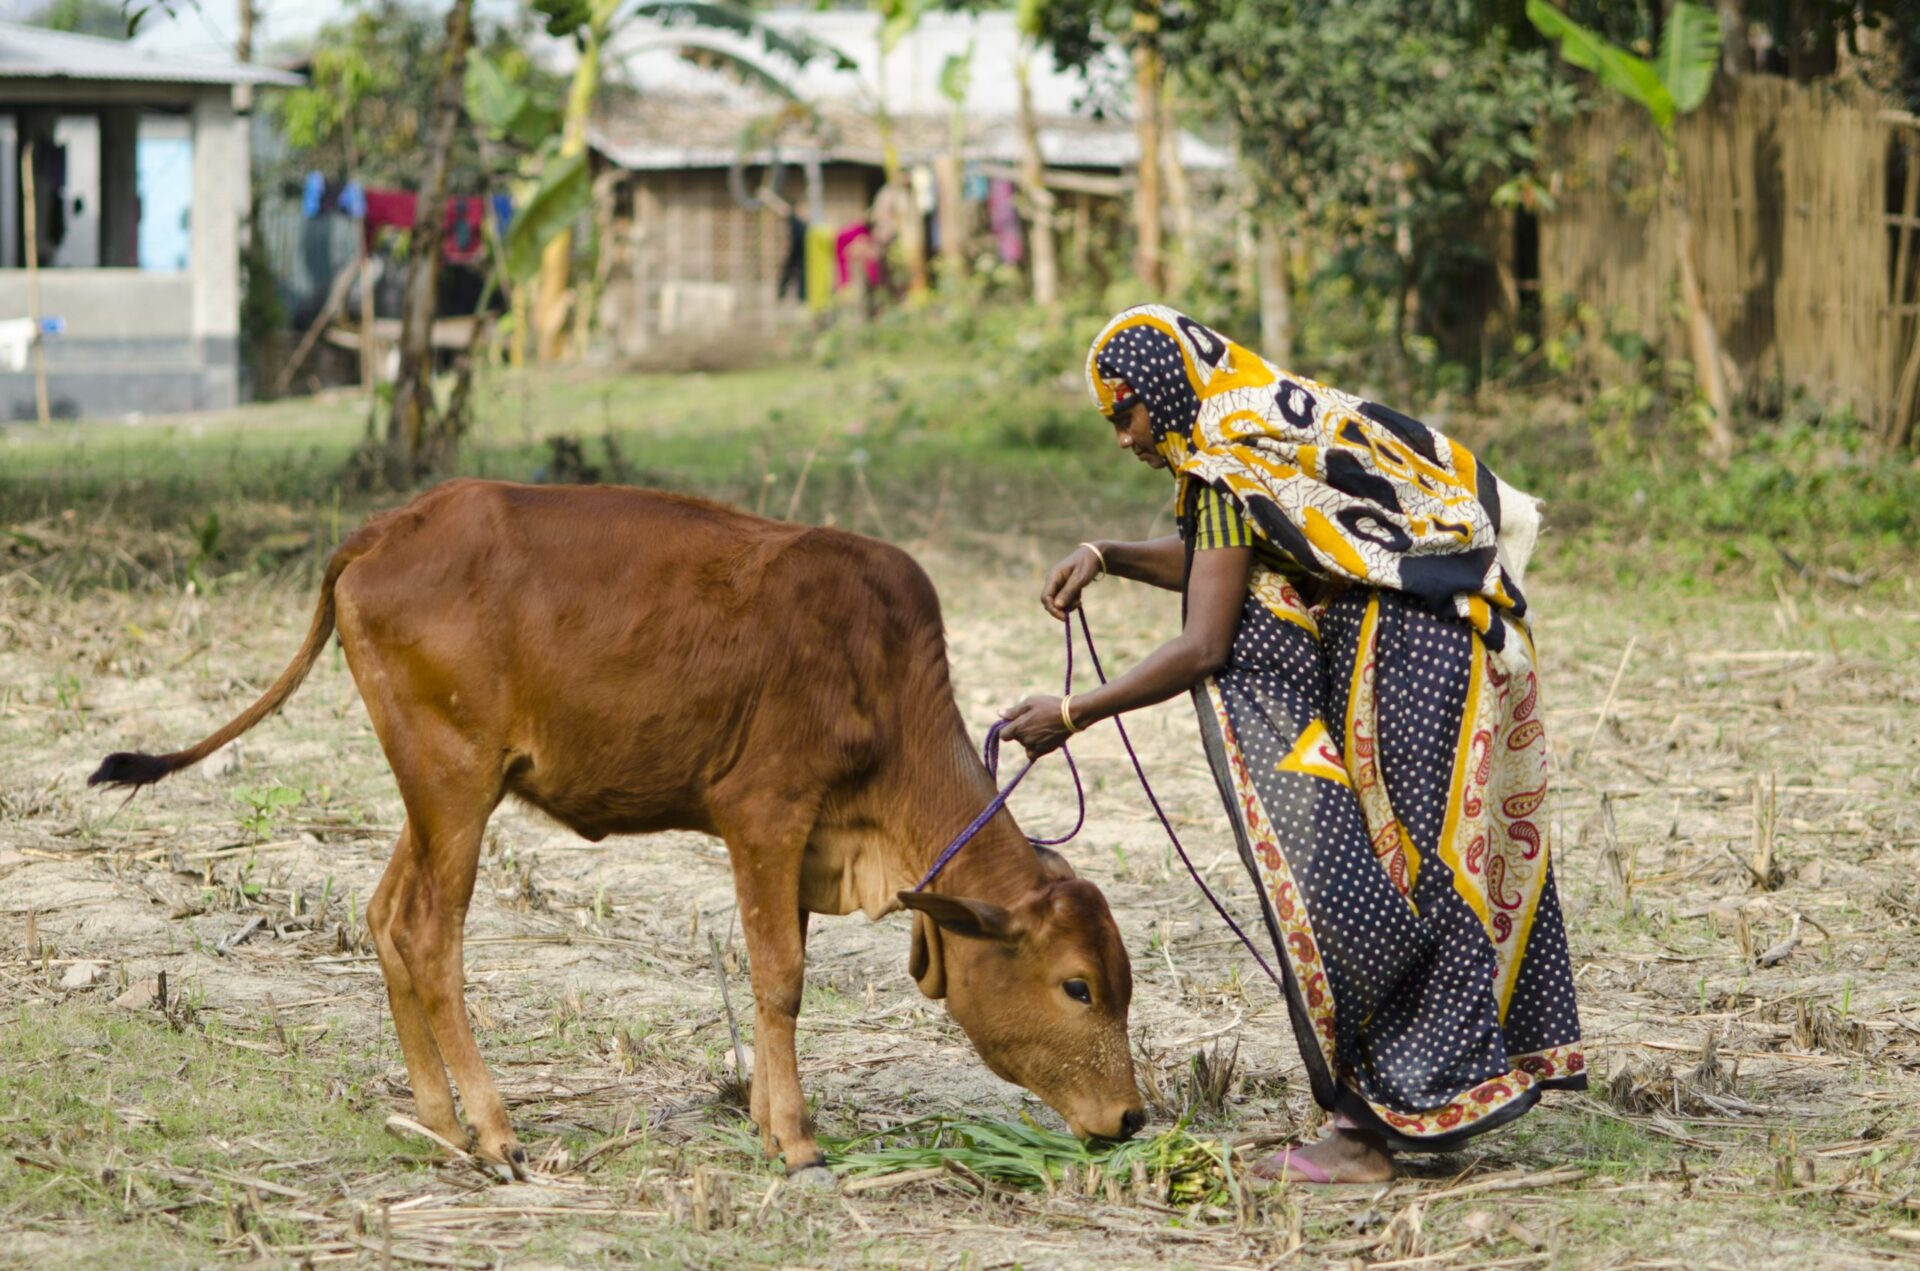 Amina tends to her livelihood asset in Bangladesh.